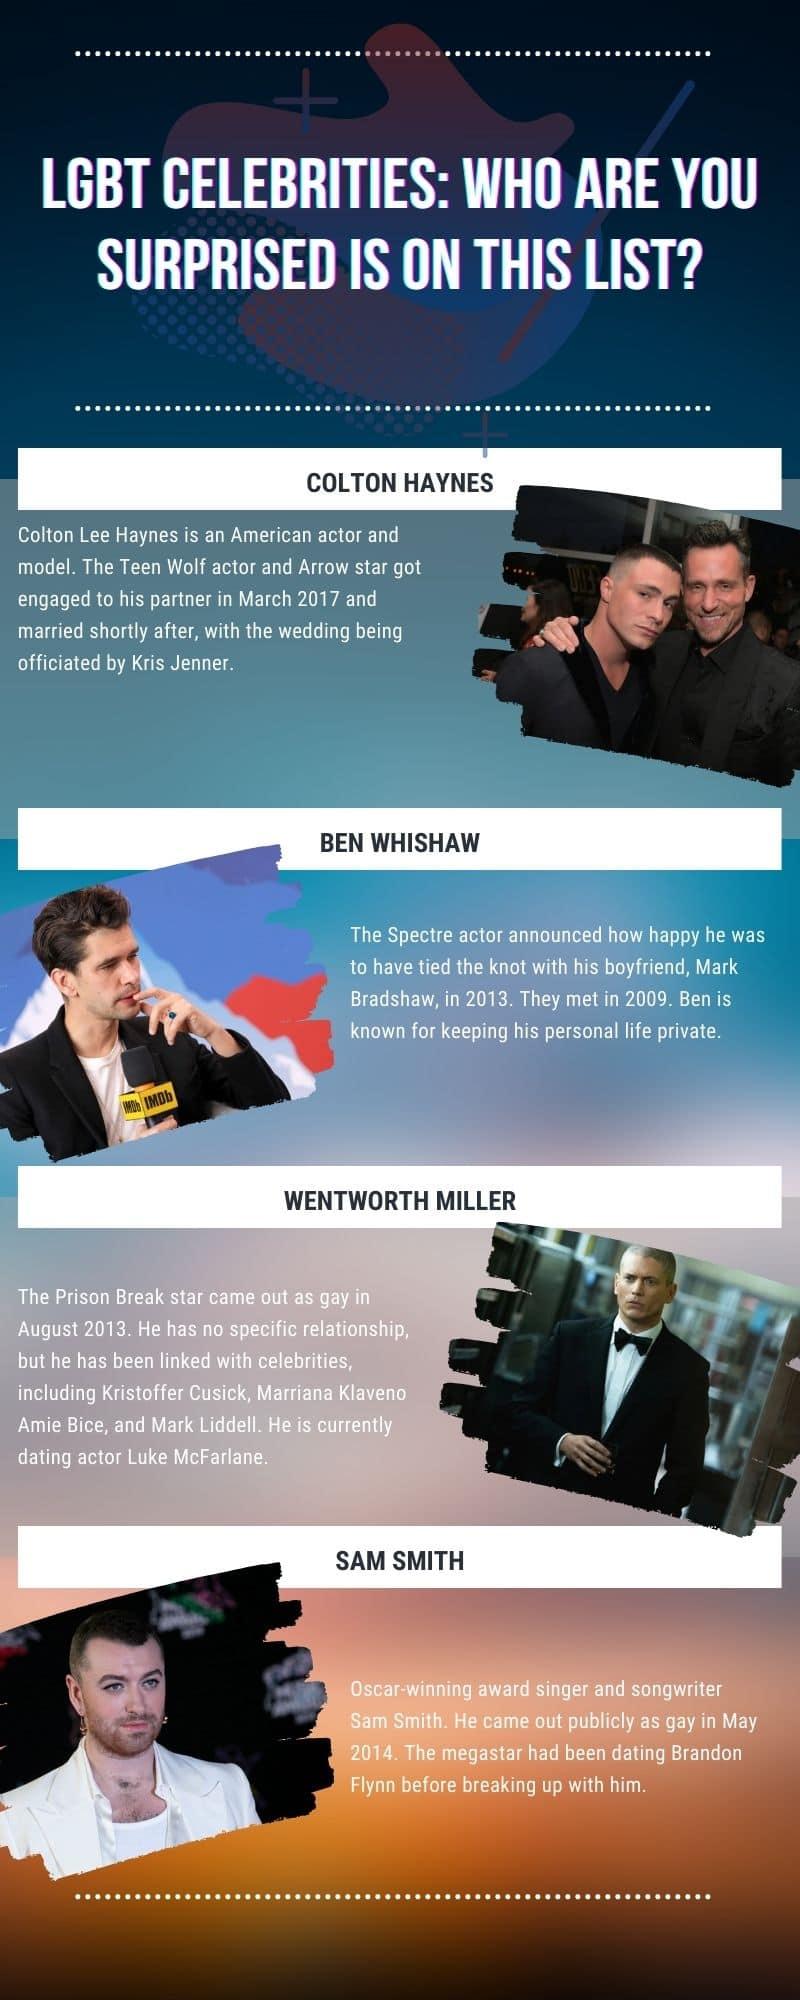 LGBT celebrities